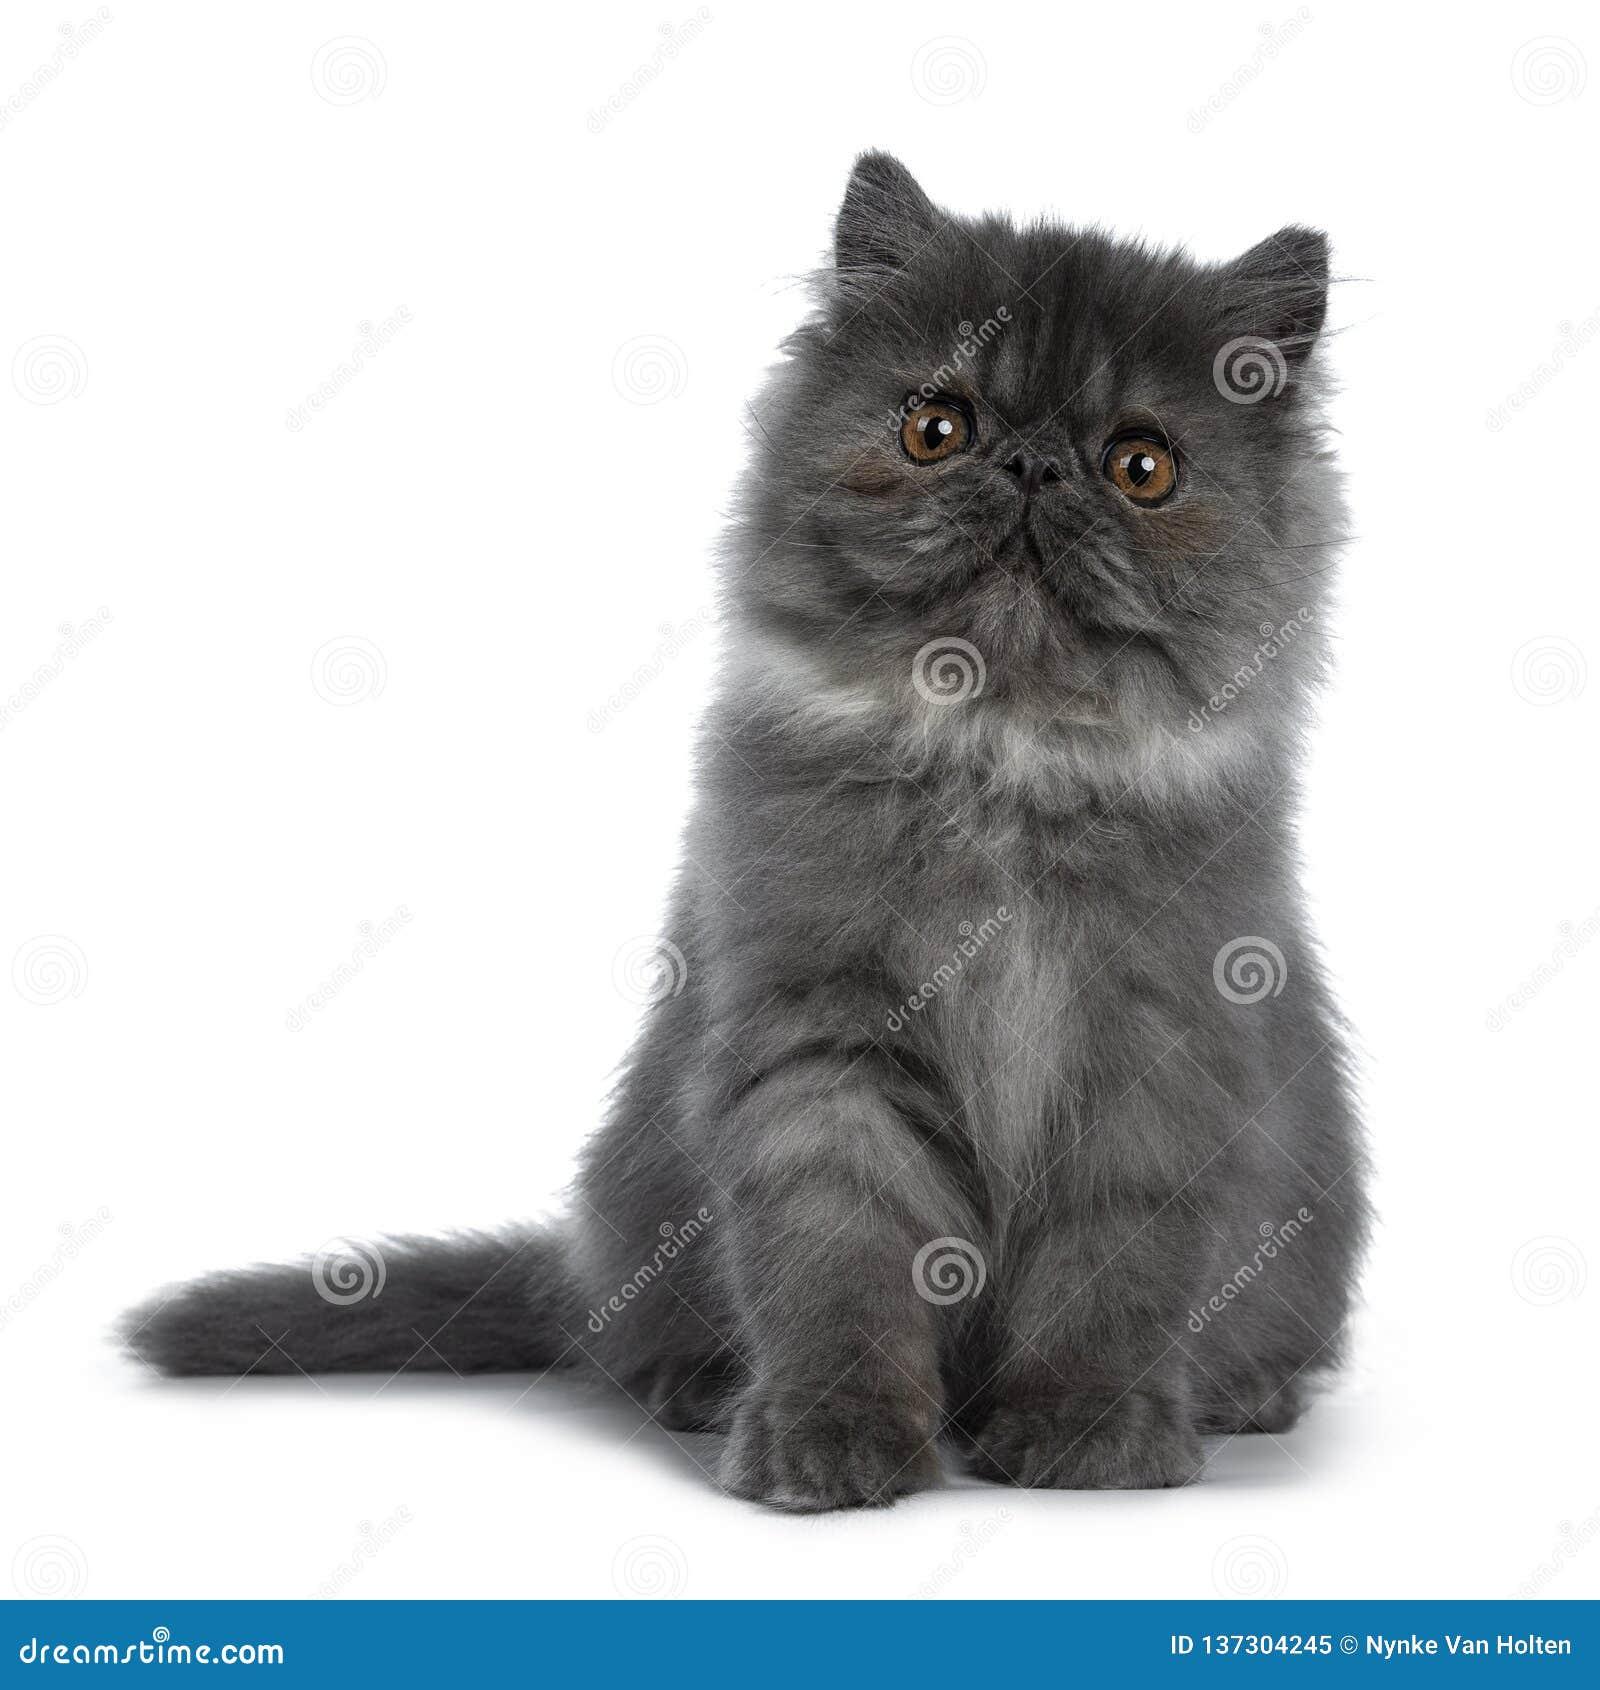 Cute Black Smoke Persian Cat Kitten, Isolated On White